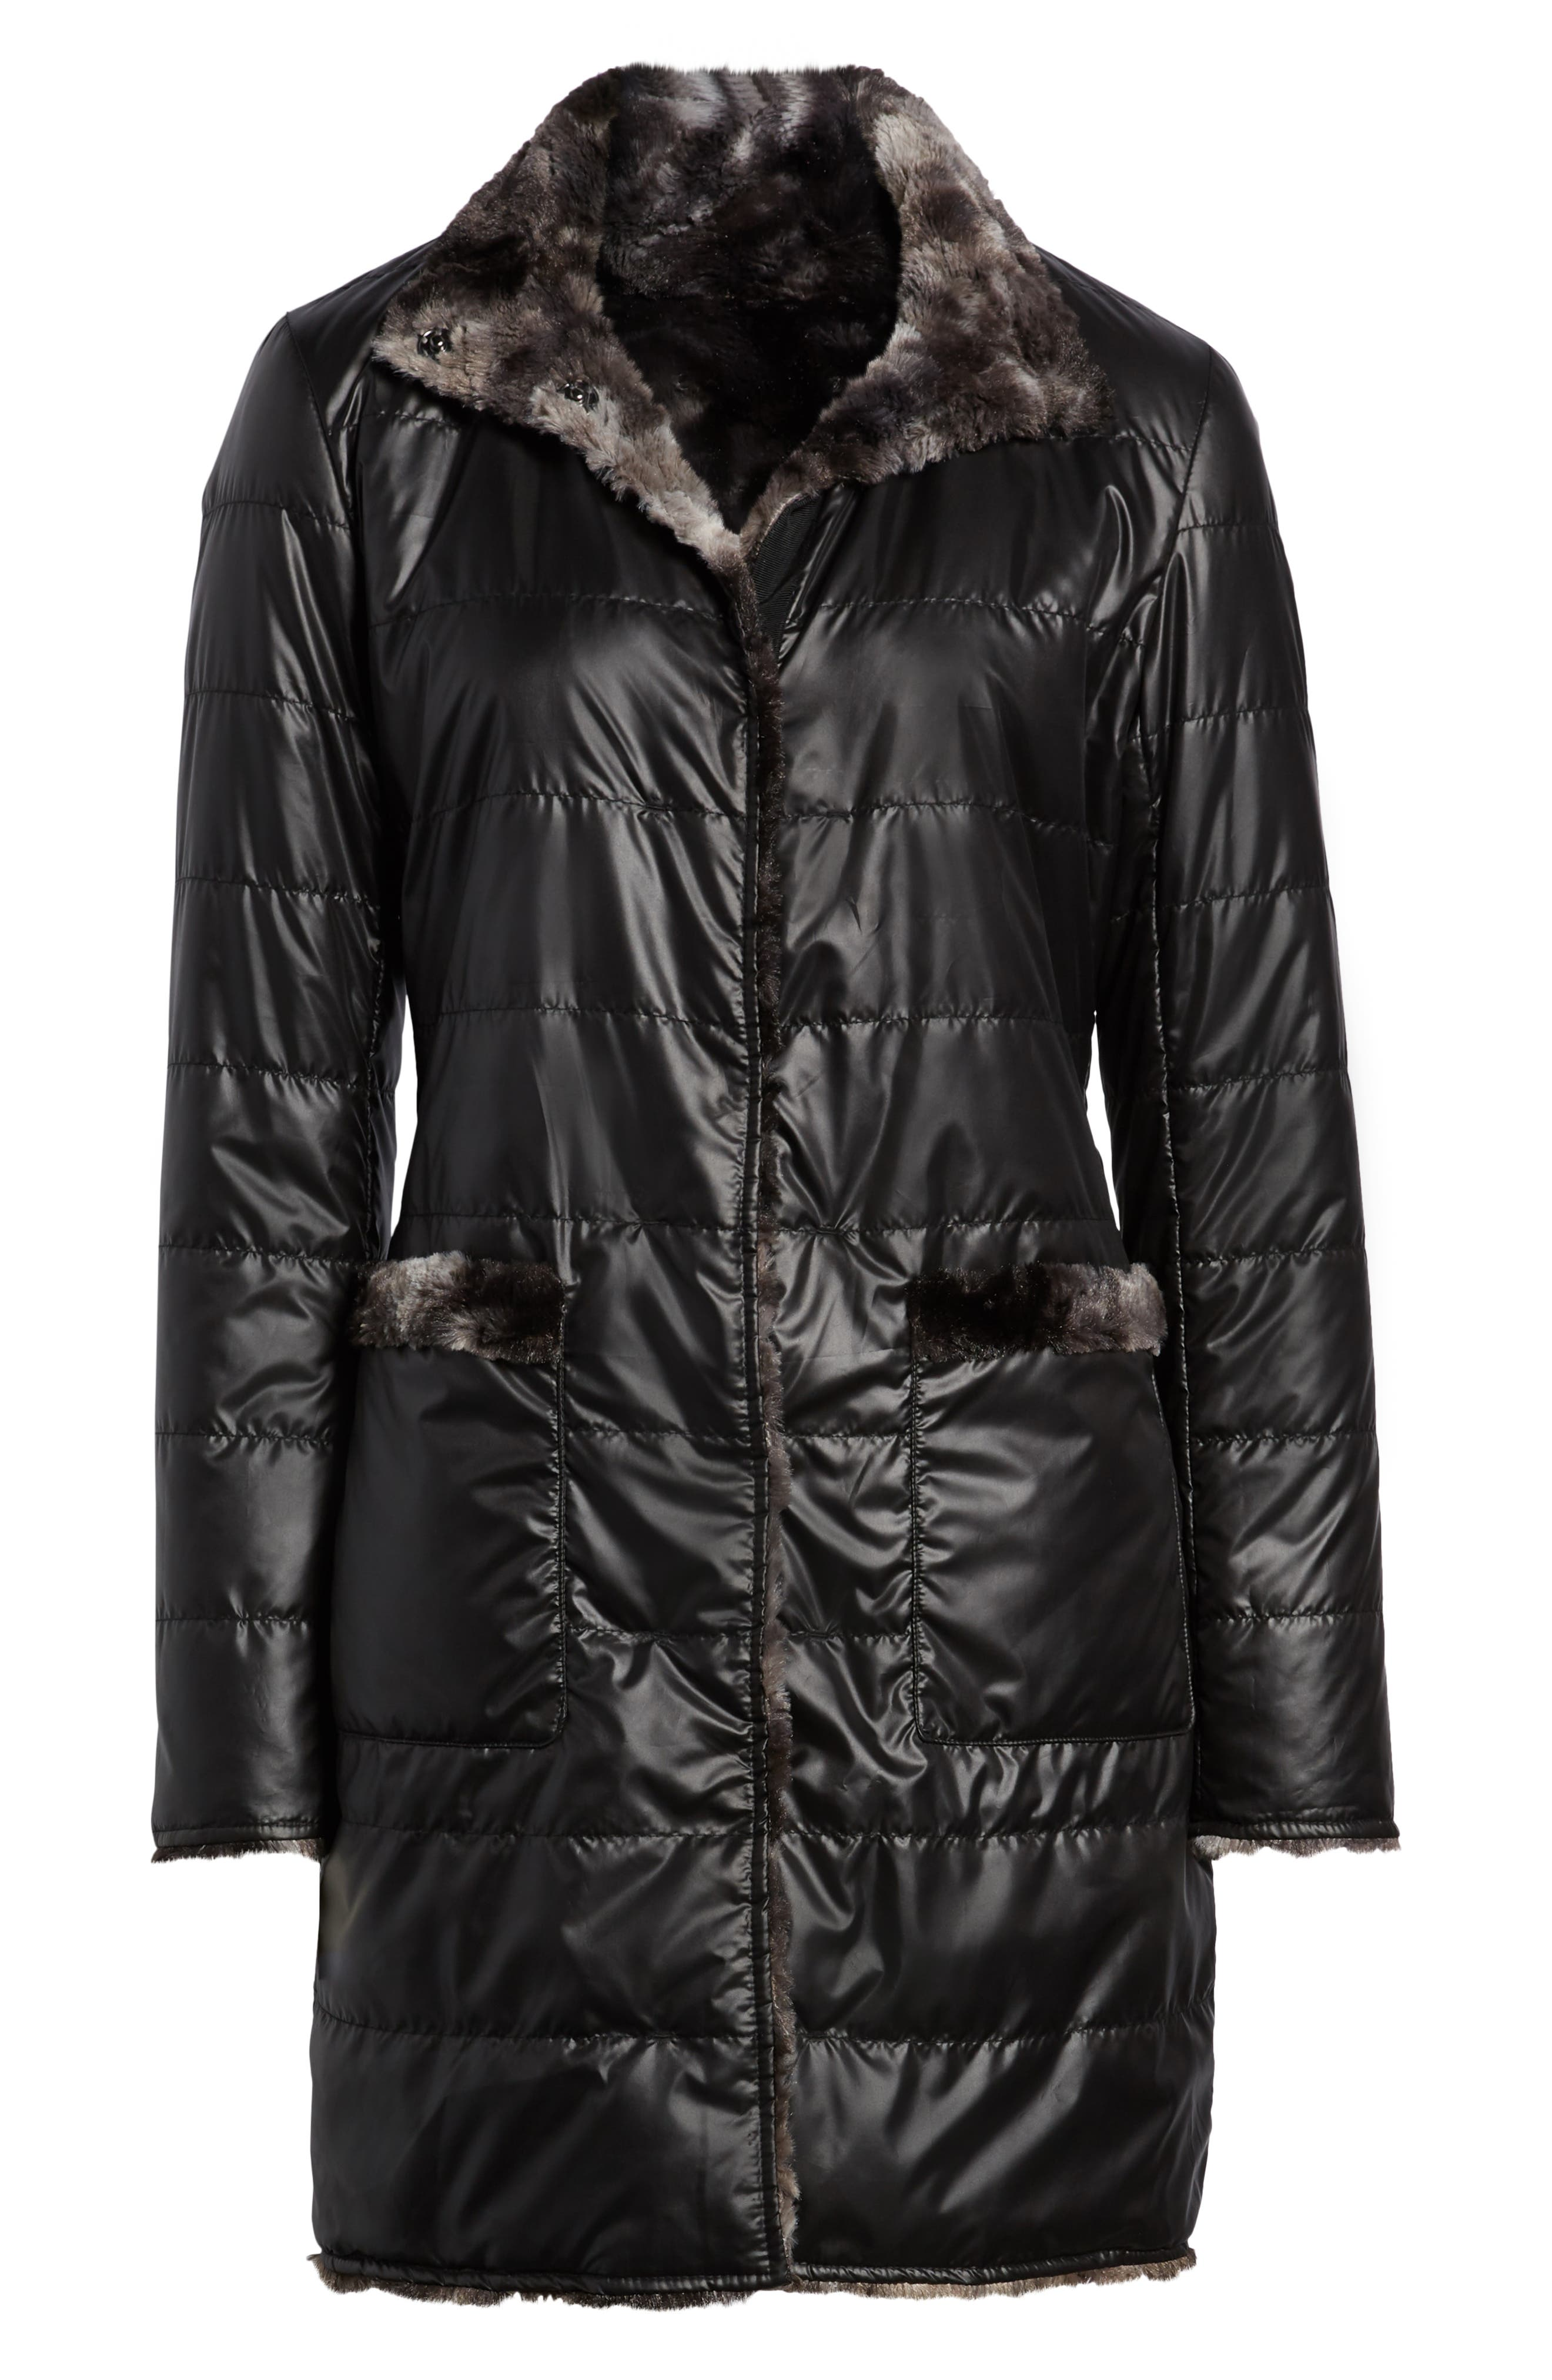 VIA SPIGA, Reversible Faux Marled Fur Coat, Alternate thumbnail 7, color, MARLED